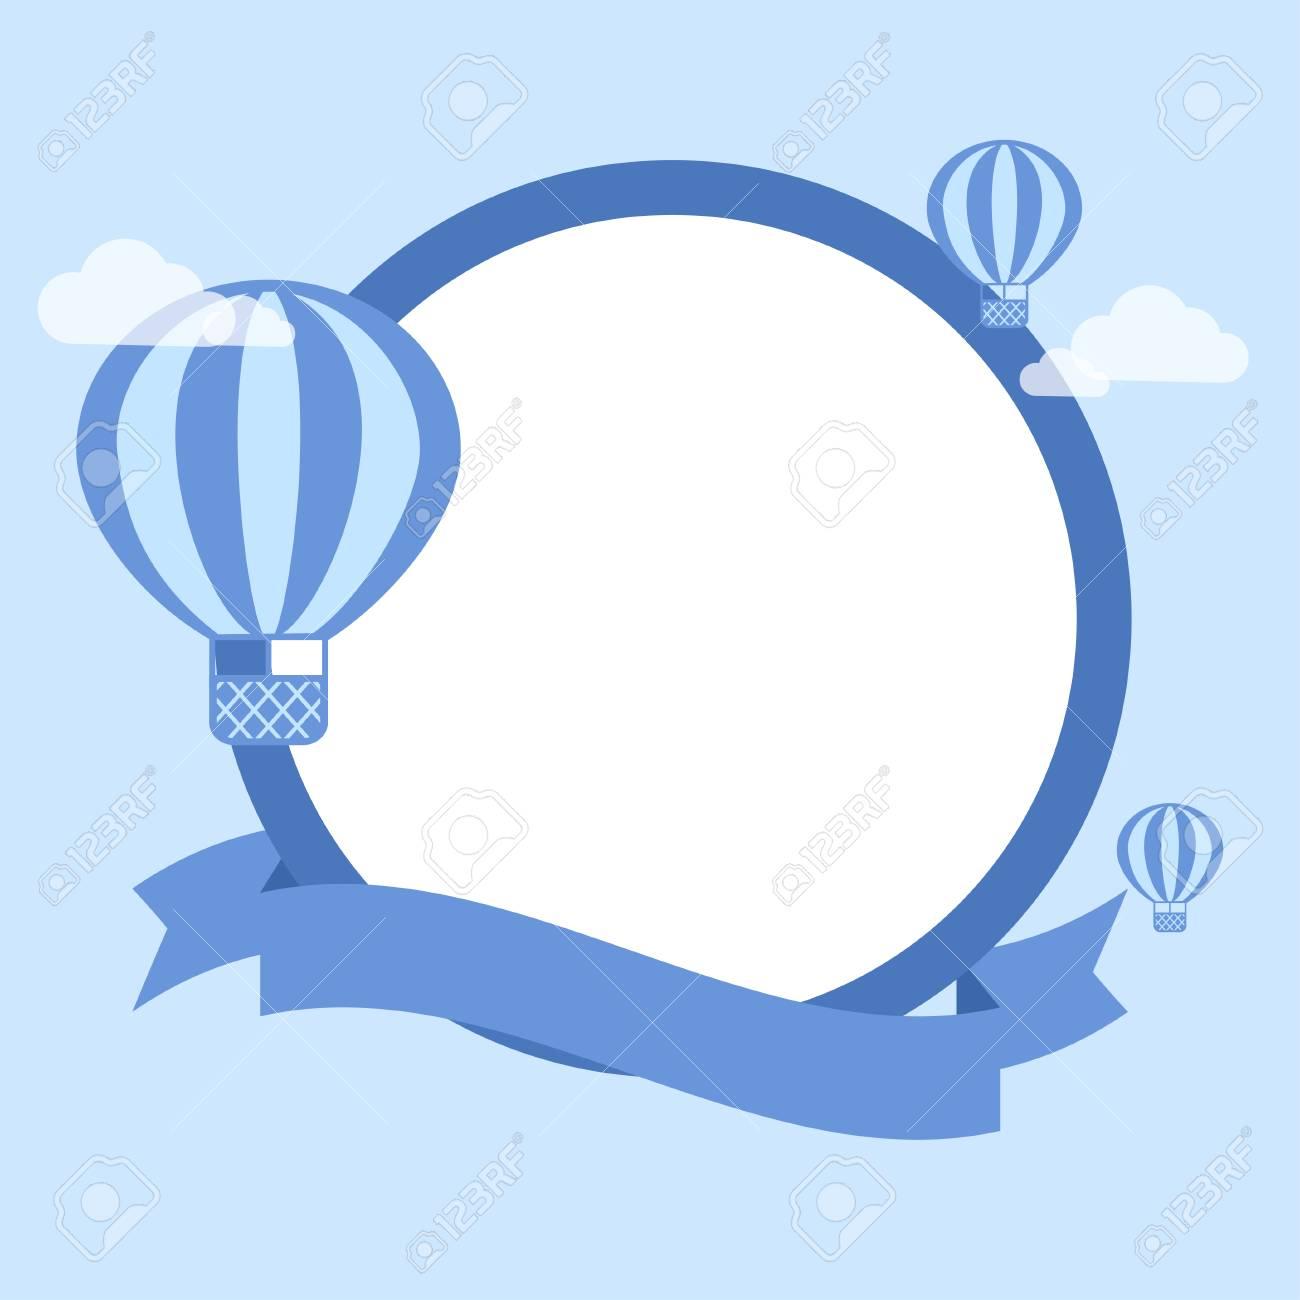 Air Balloon Template | Cartoon Hot Air Balloon Vector Background Template For Greeting